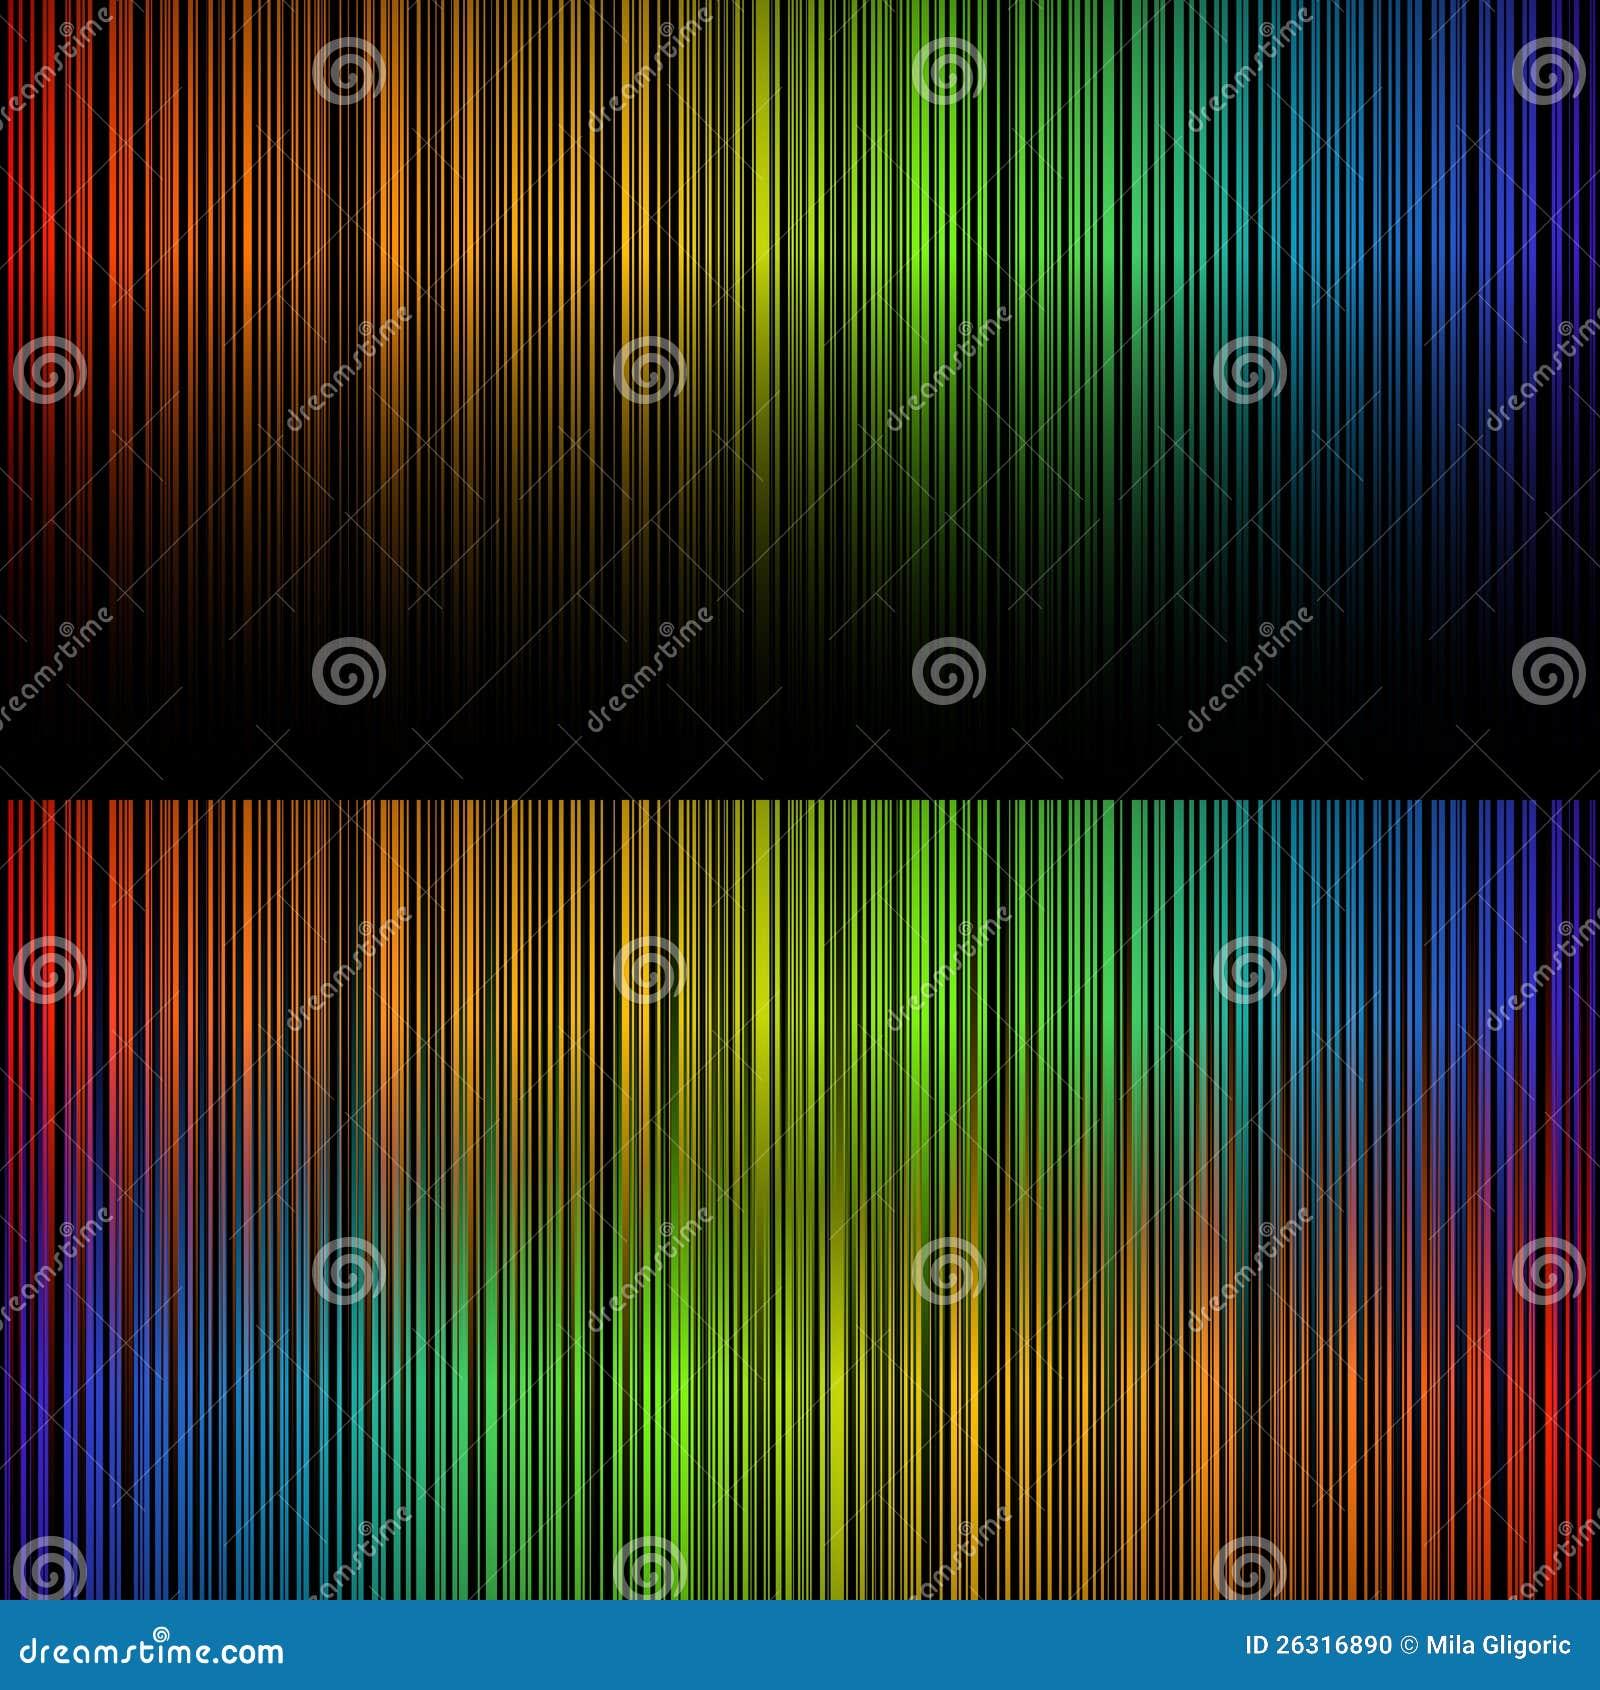 spectrum of light background - photo #33